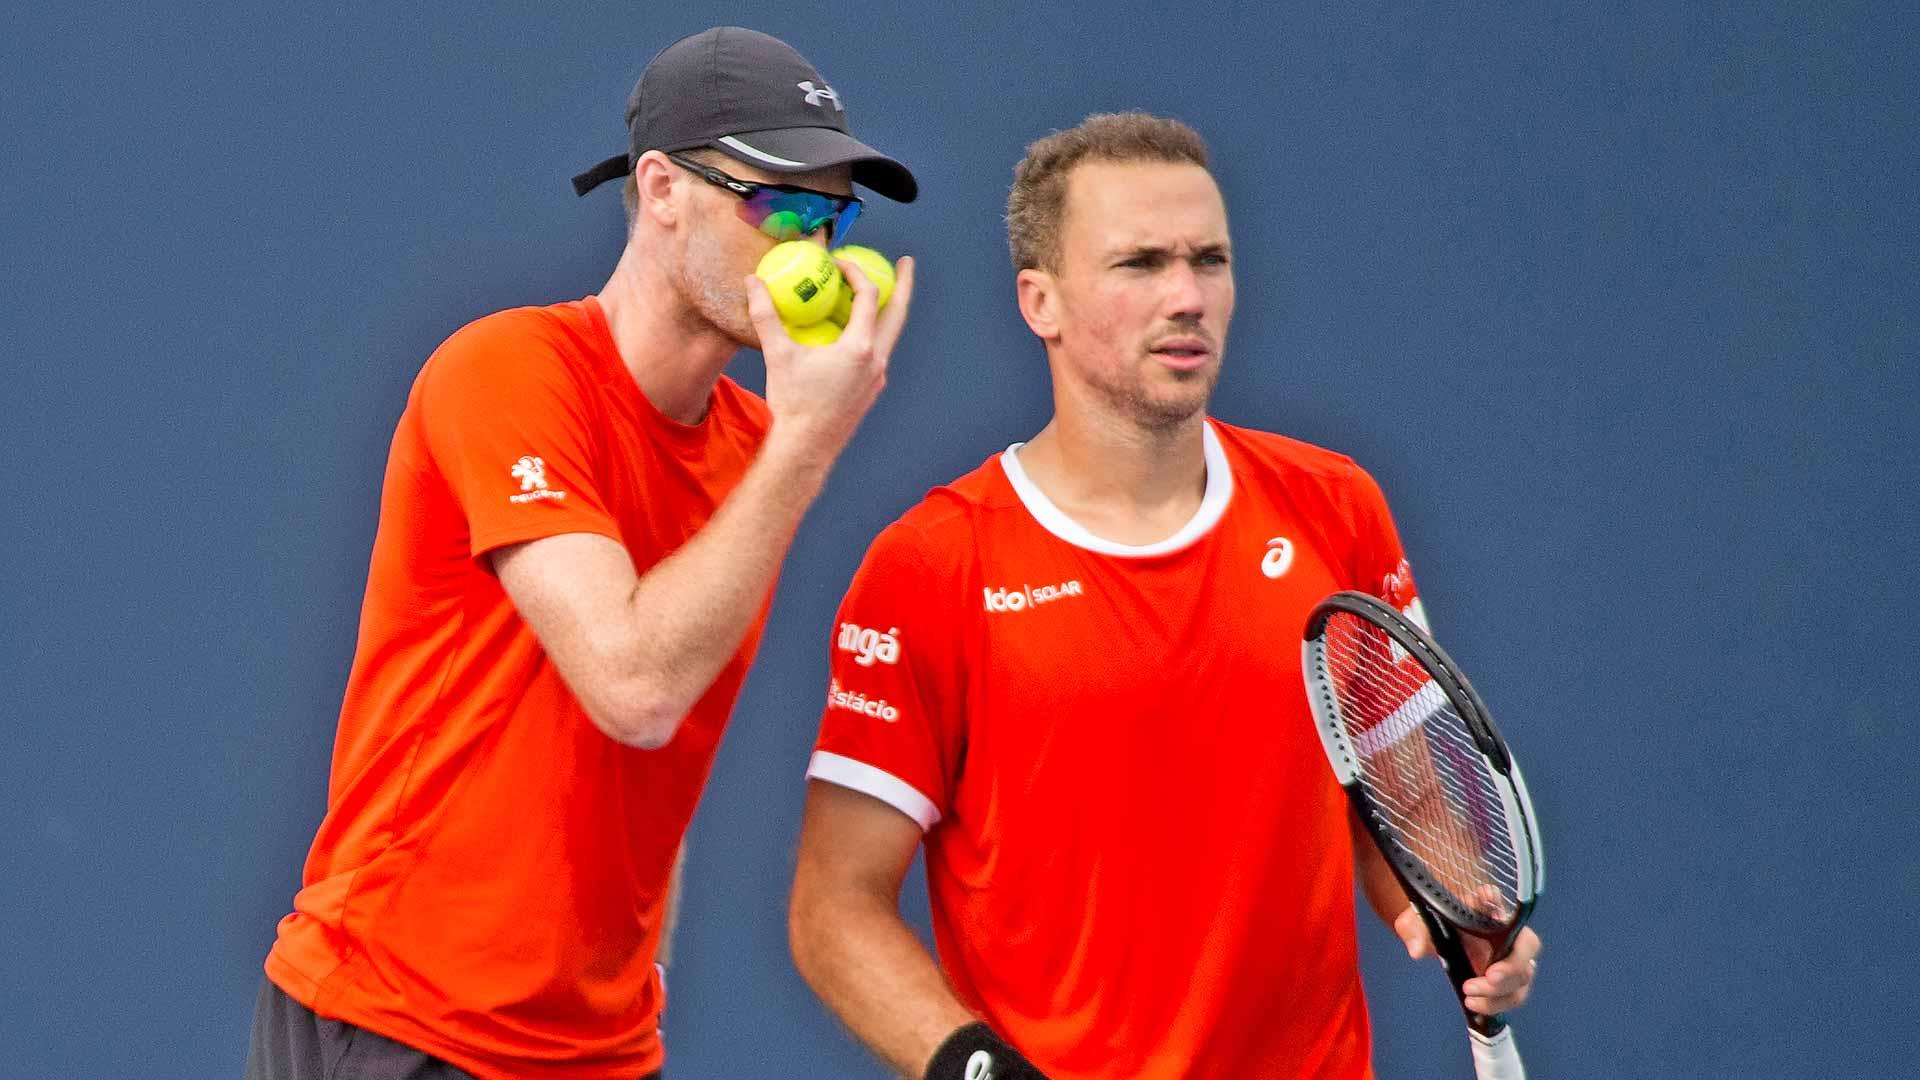 ATP - 2007 US Mens Clay Court Championships - Quarter